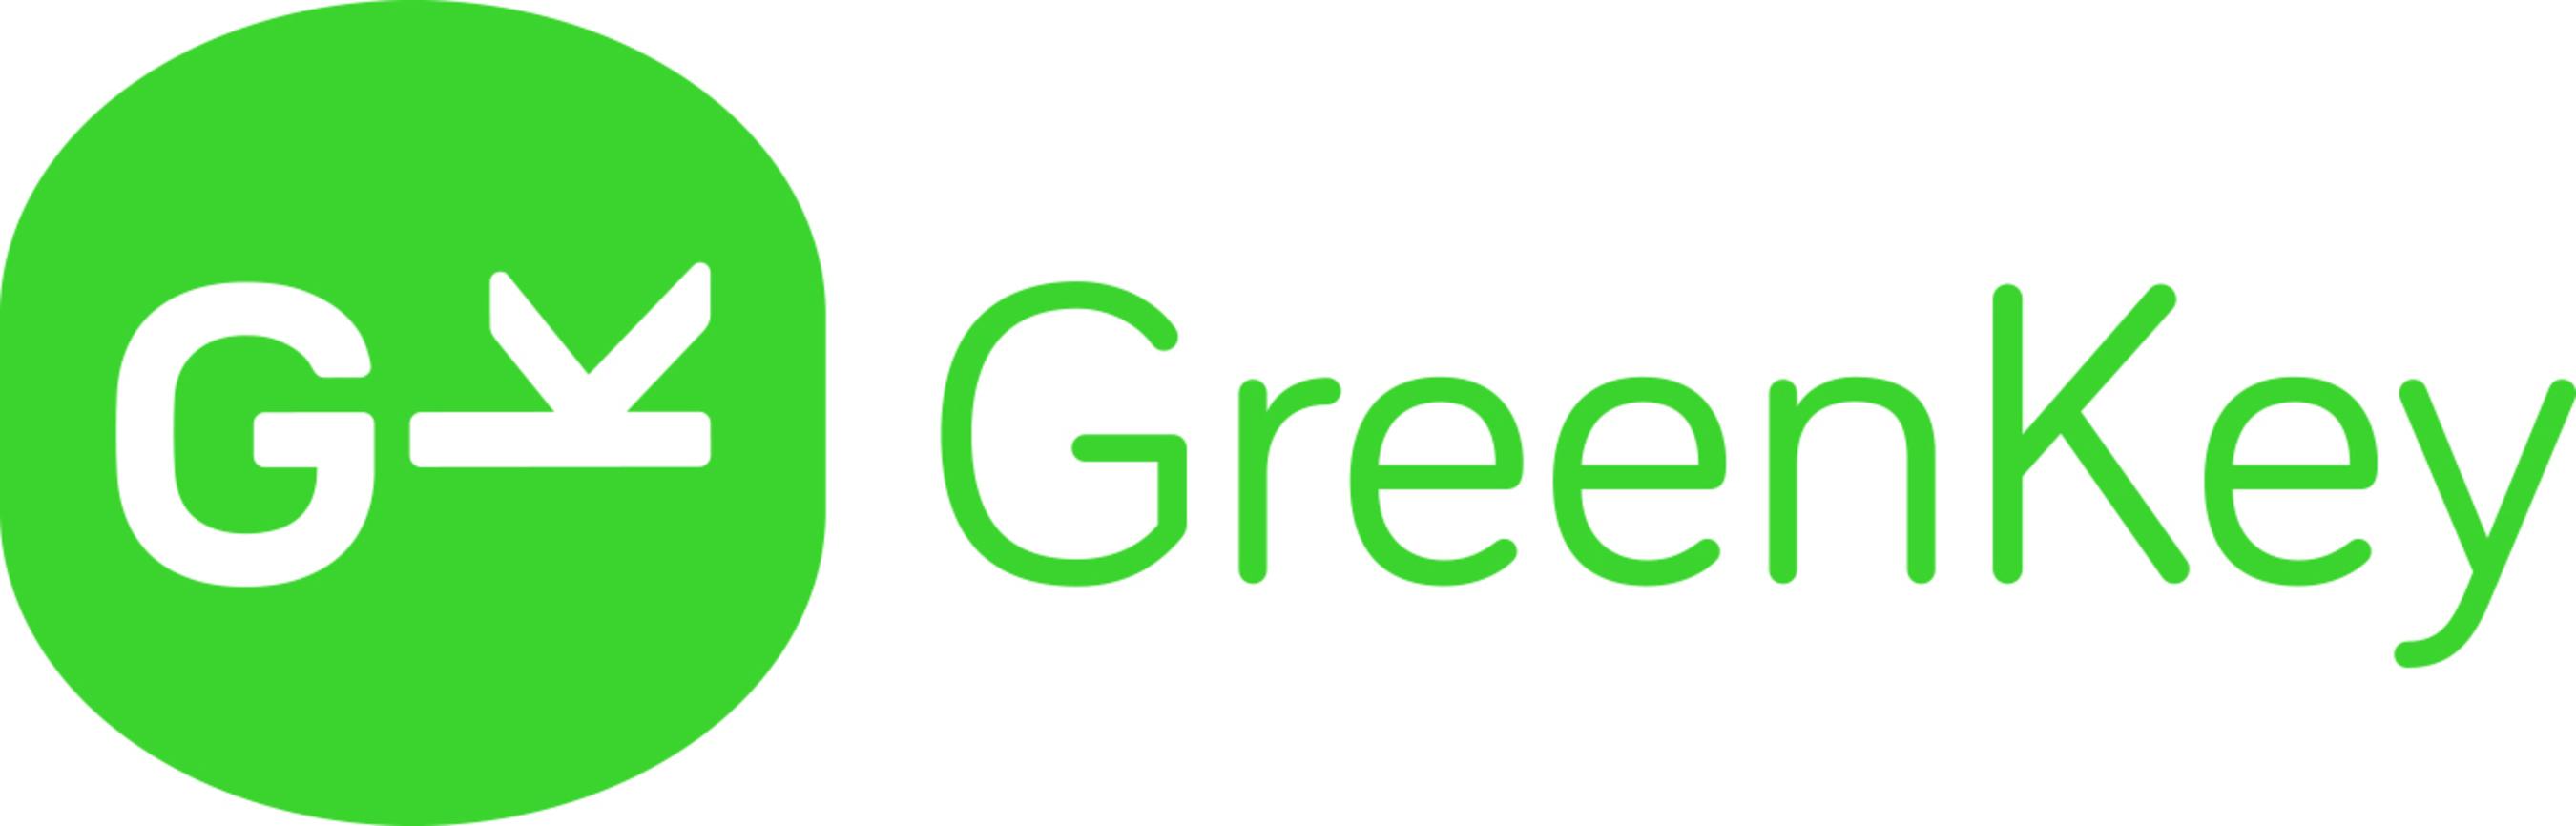 Green Key Technologies Appoints Paul Christensen as CEO